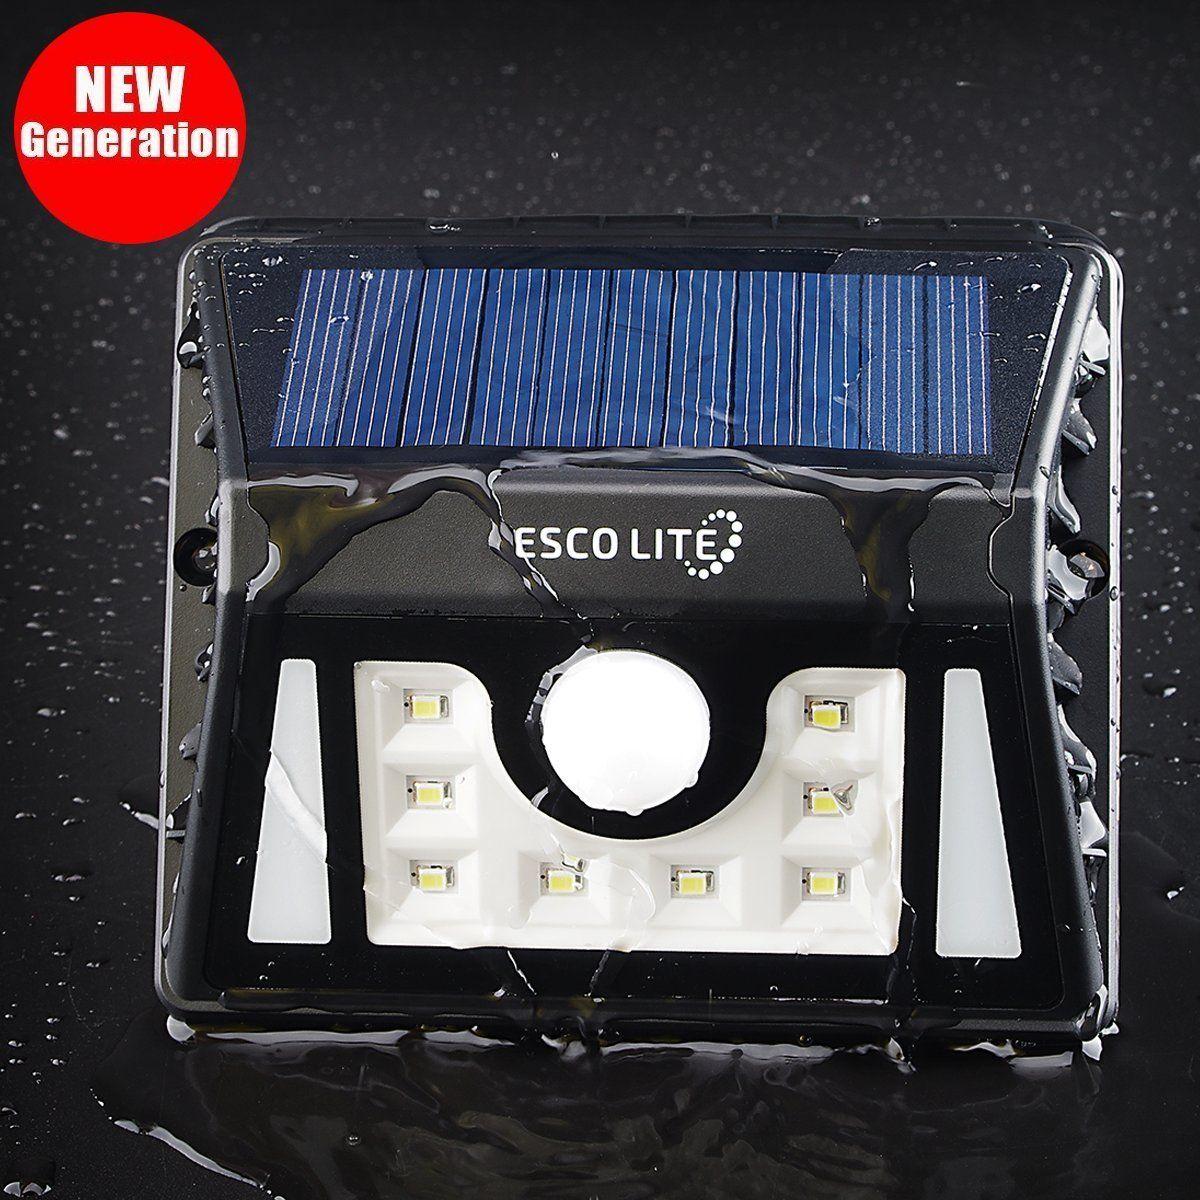 Escolite Solar Lights With Motion Sensor For Outdoor